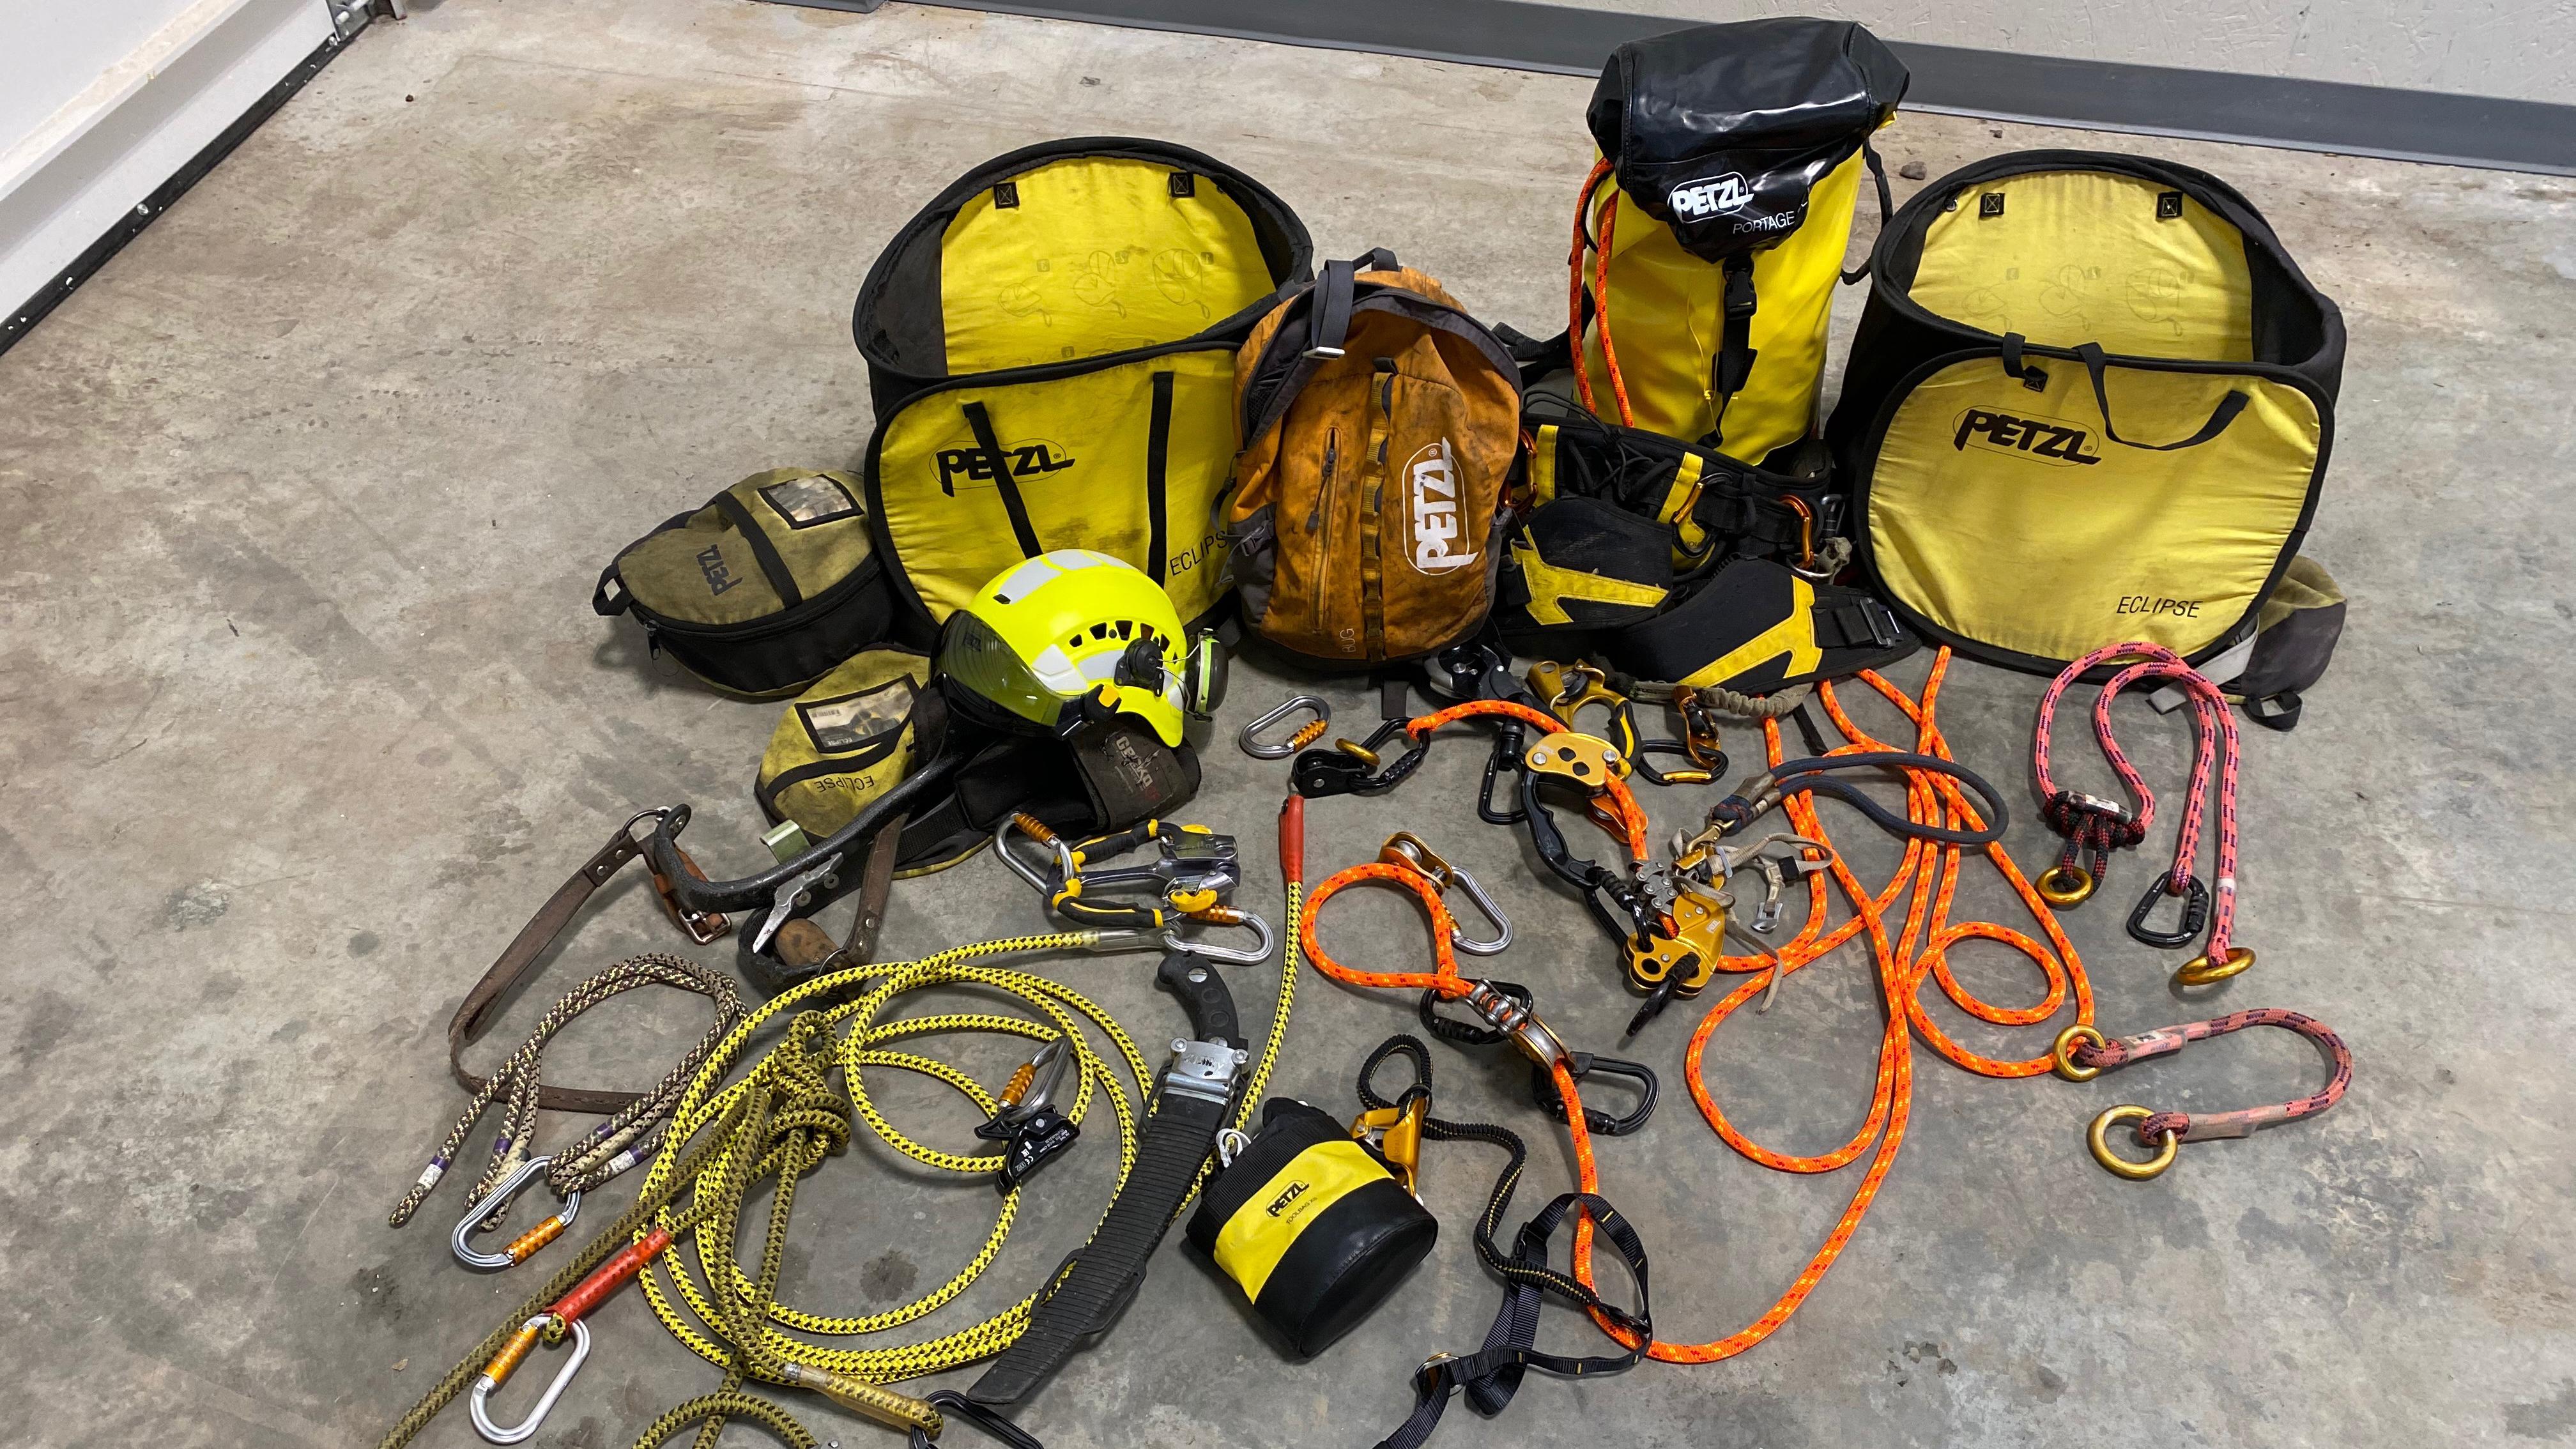 What's in Arborist Ryan Torcicollo's Pack?